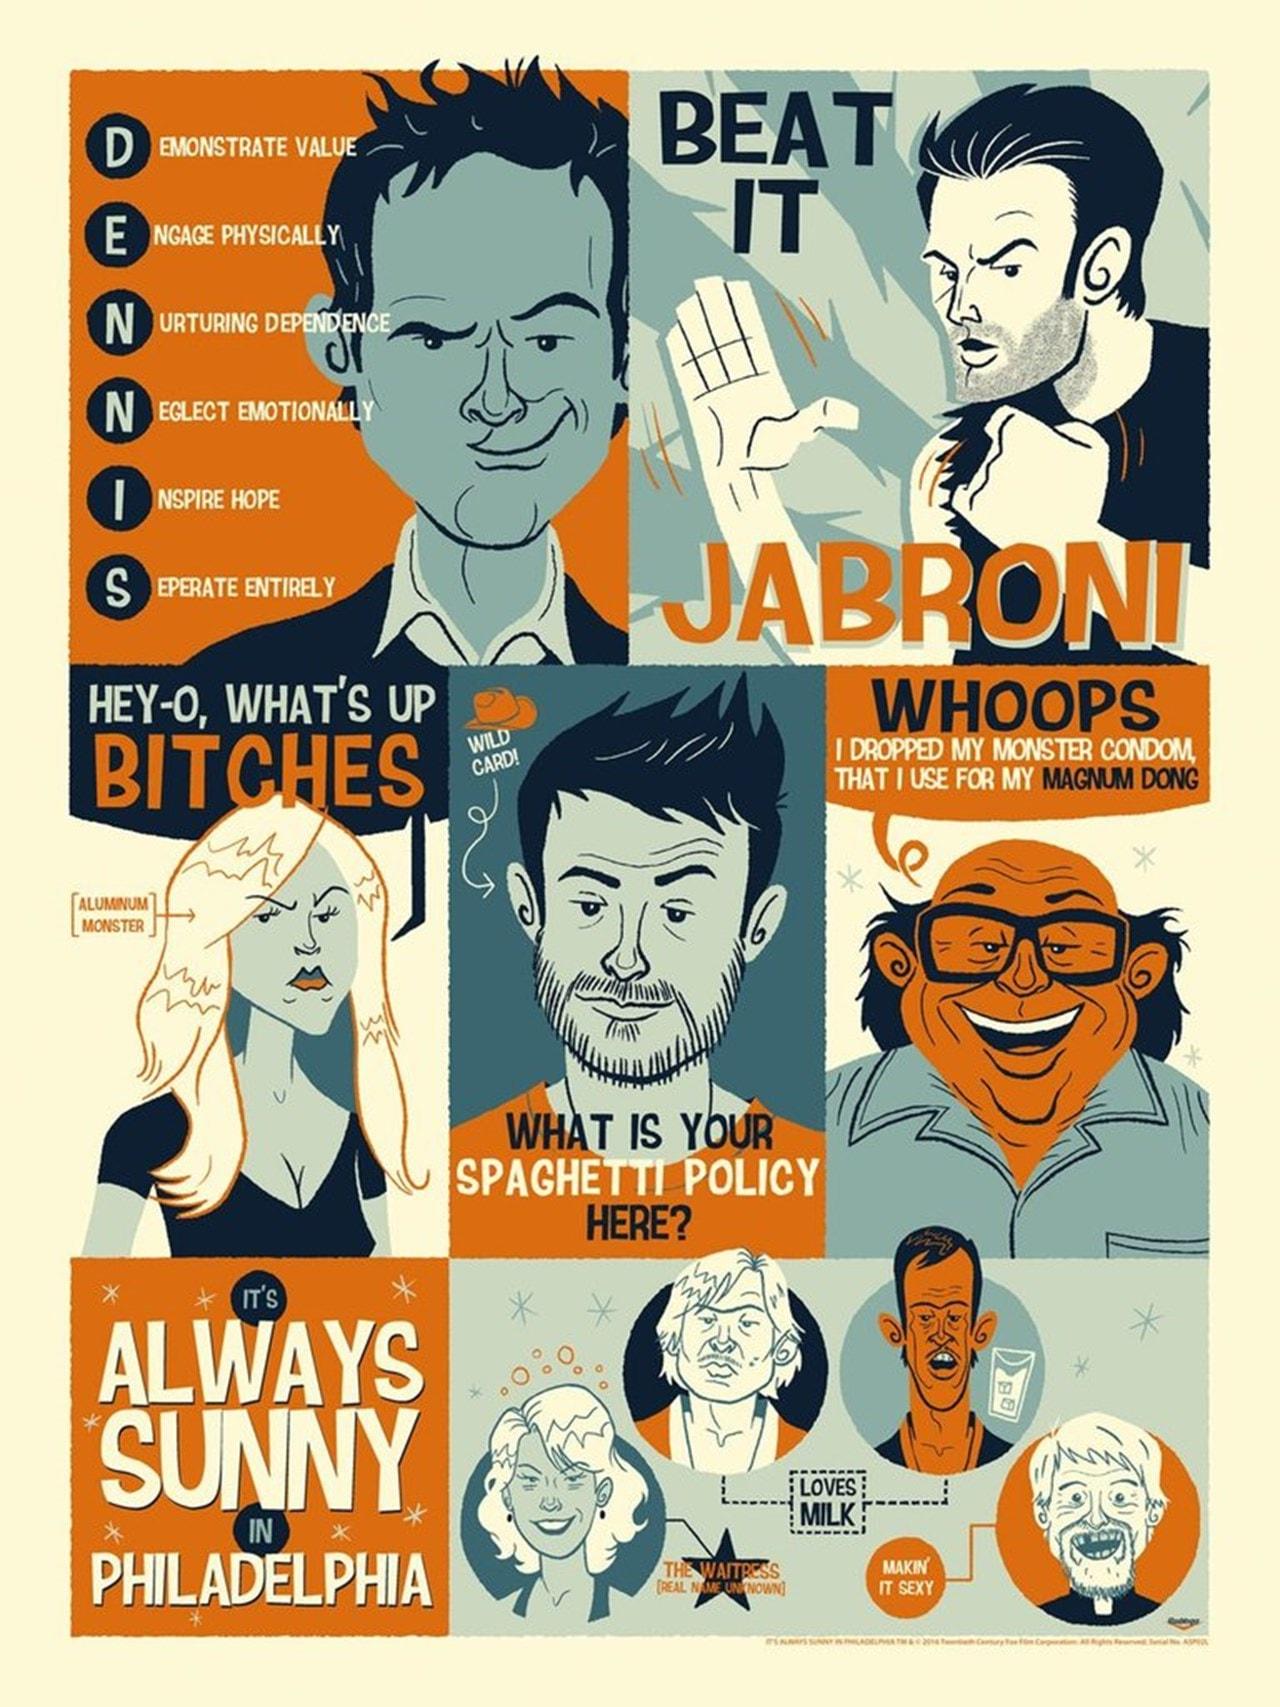 It's Always Sunny In Philadelphia: Always Quoting Limited Edition Art Print - 1